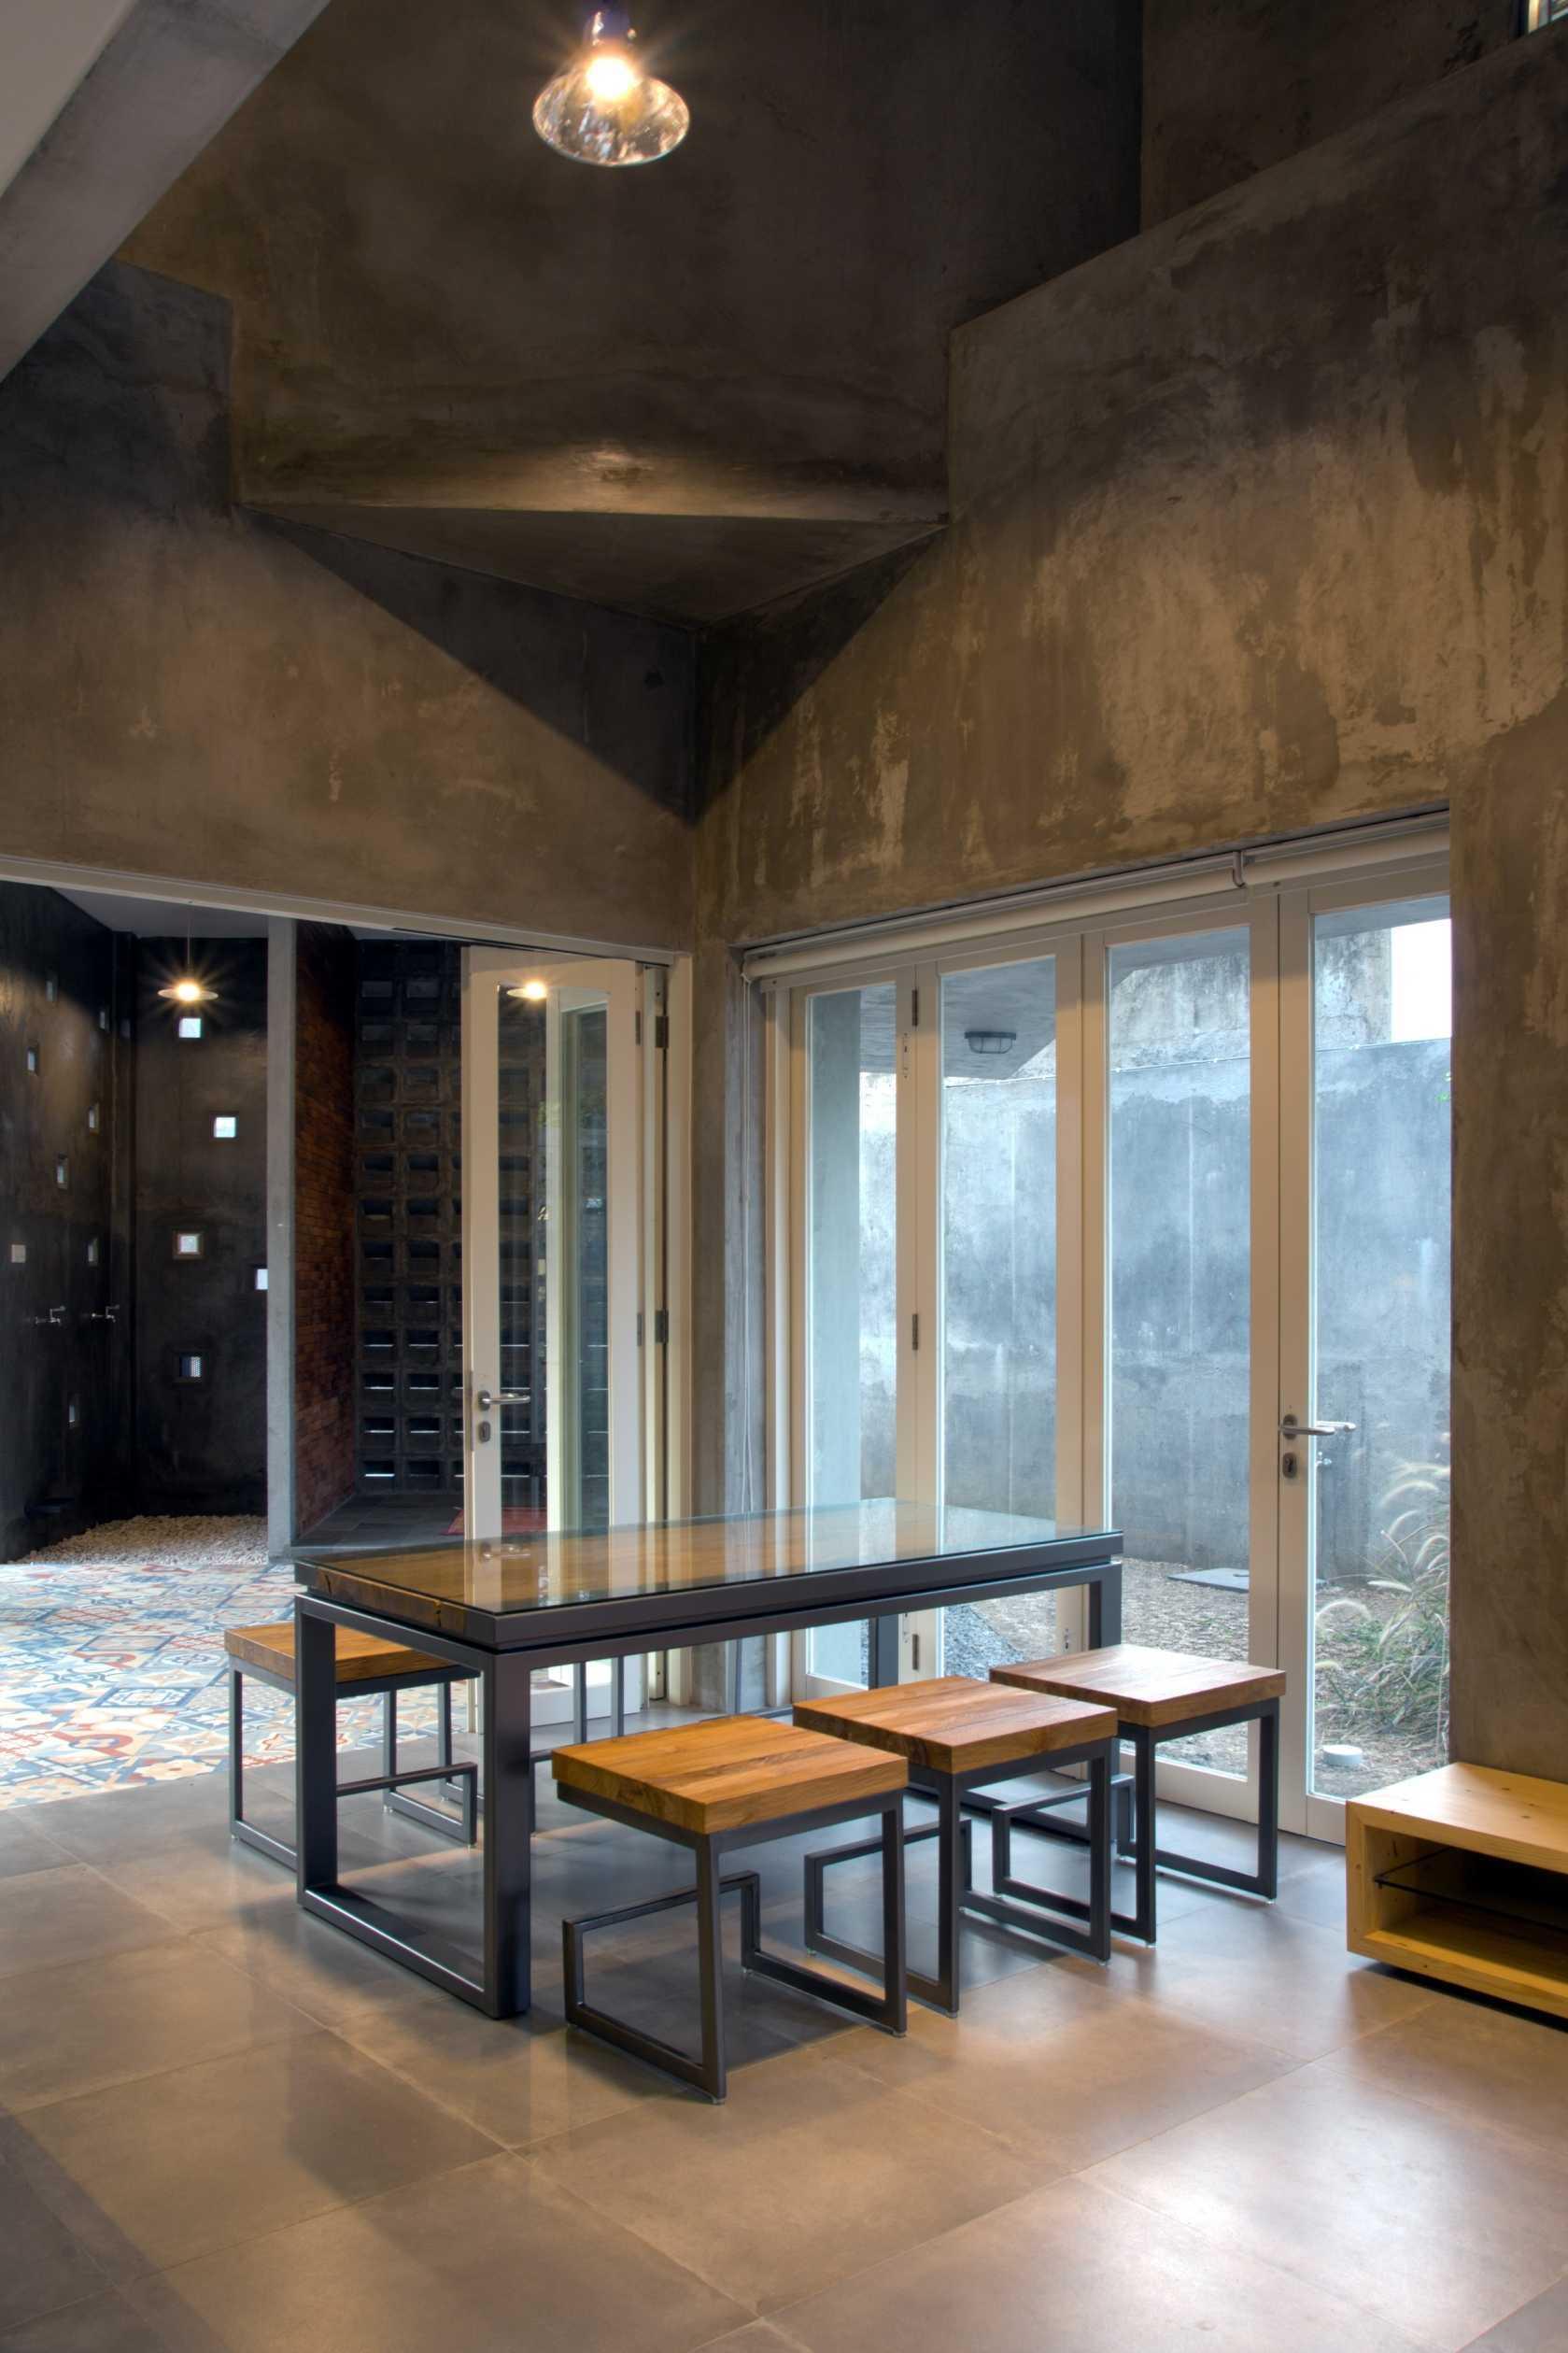 Andyrahman Architect Rumah Miring Surabaya, Indonesia Surabaya, Indonesia Dining Room Industrial  10988